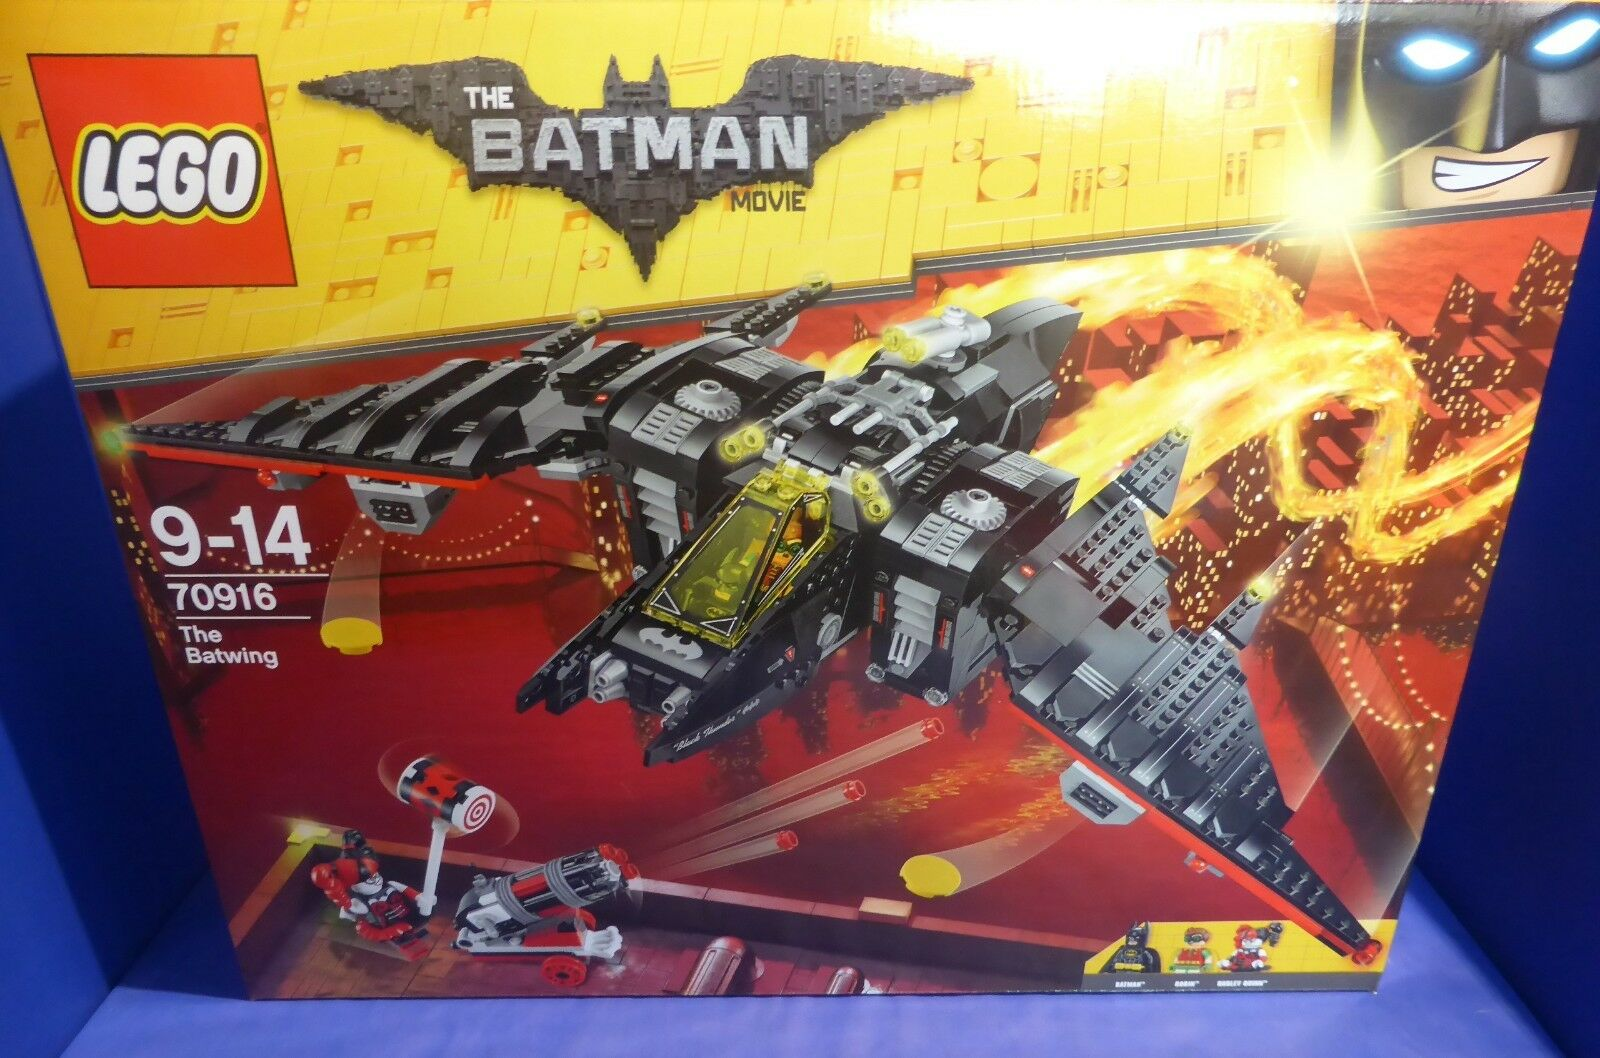 LEGO Batman 70916 batwing m. Batman Robin Harley Quinn nuevo caja original